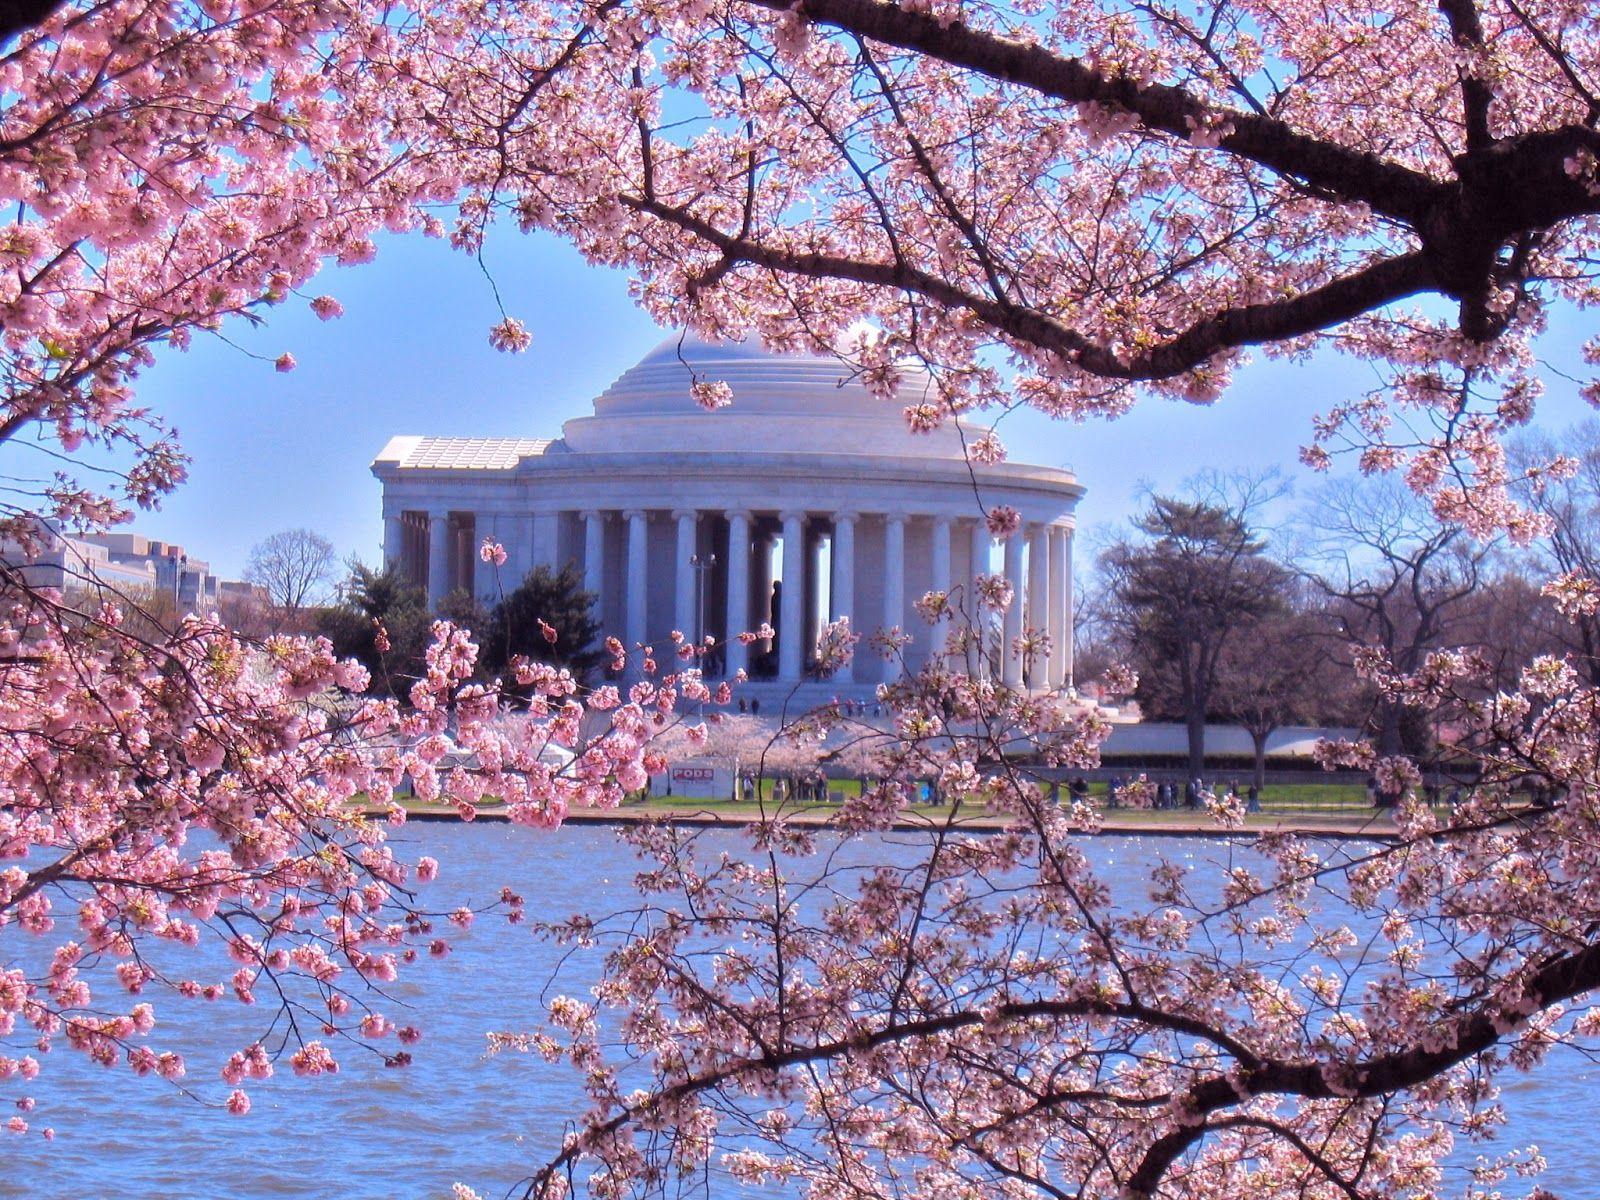 Washington Cherry Blossoms Columbia S Own Cherry Blossom Festival Cherry Blossom Festival Cherry Blossom Washington Dc Cherry Blossom Dc